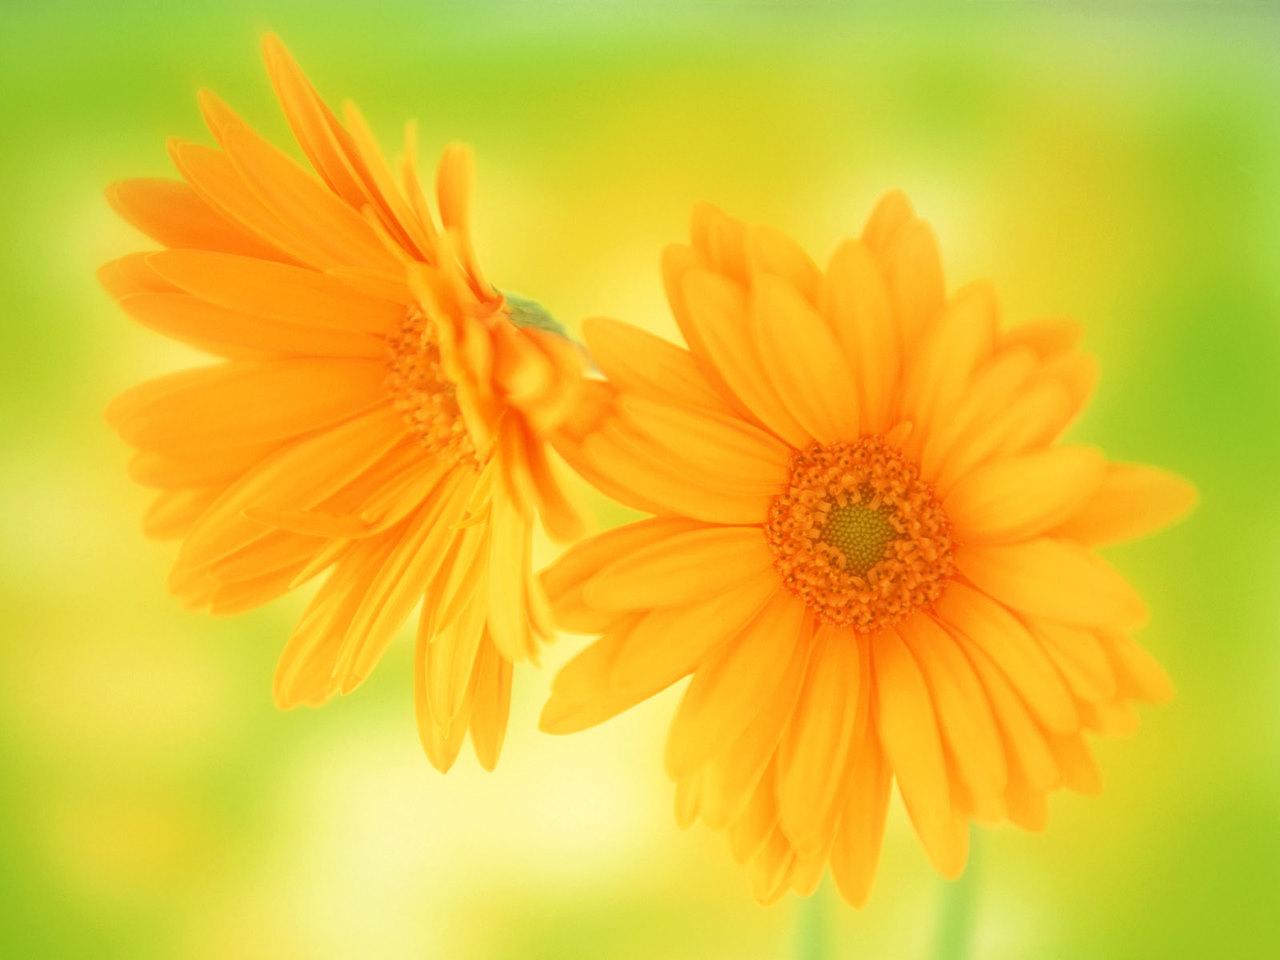 wallpaper: beautiful flowers wallpaper free download 1280x960